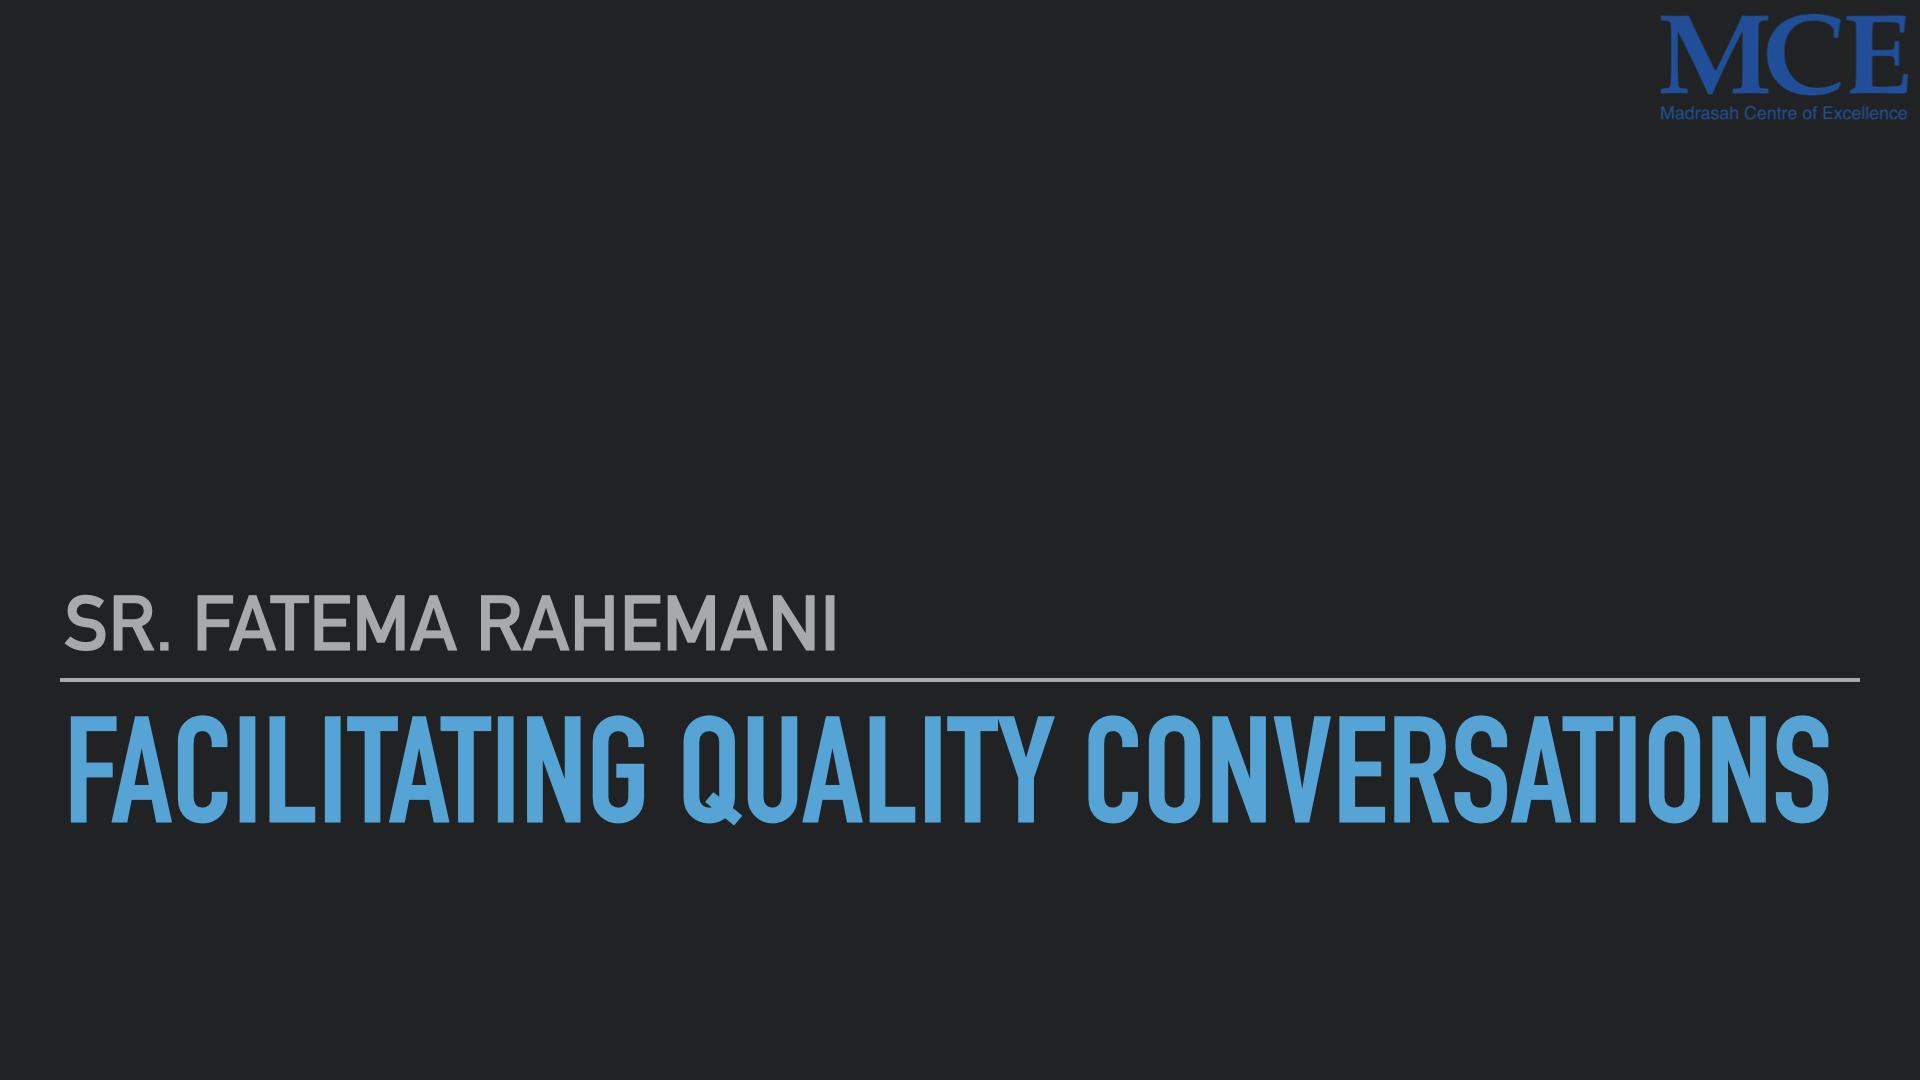 Facilitating quality conversations